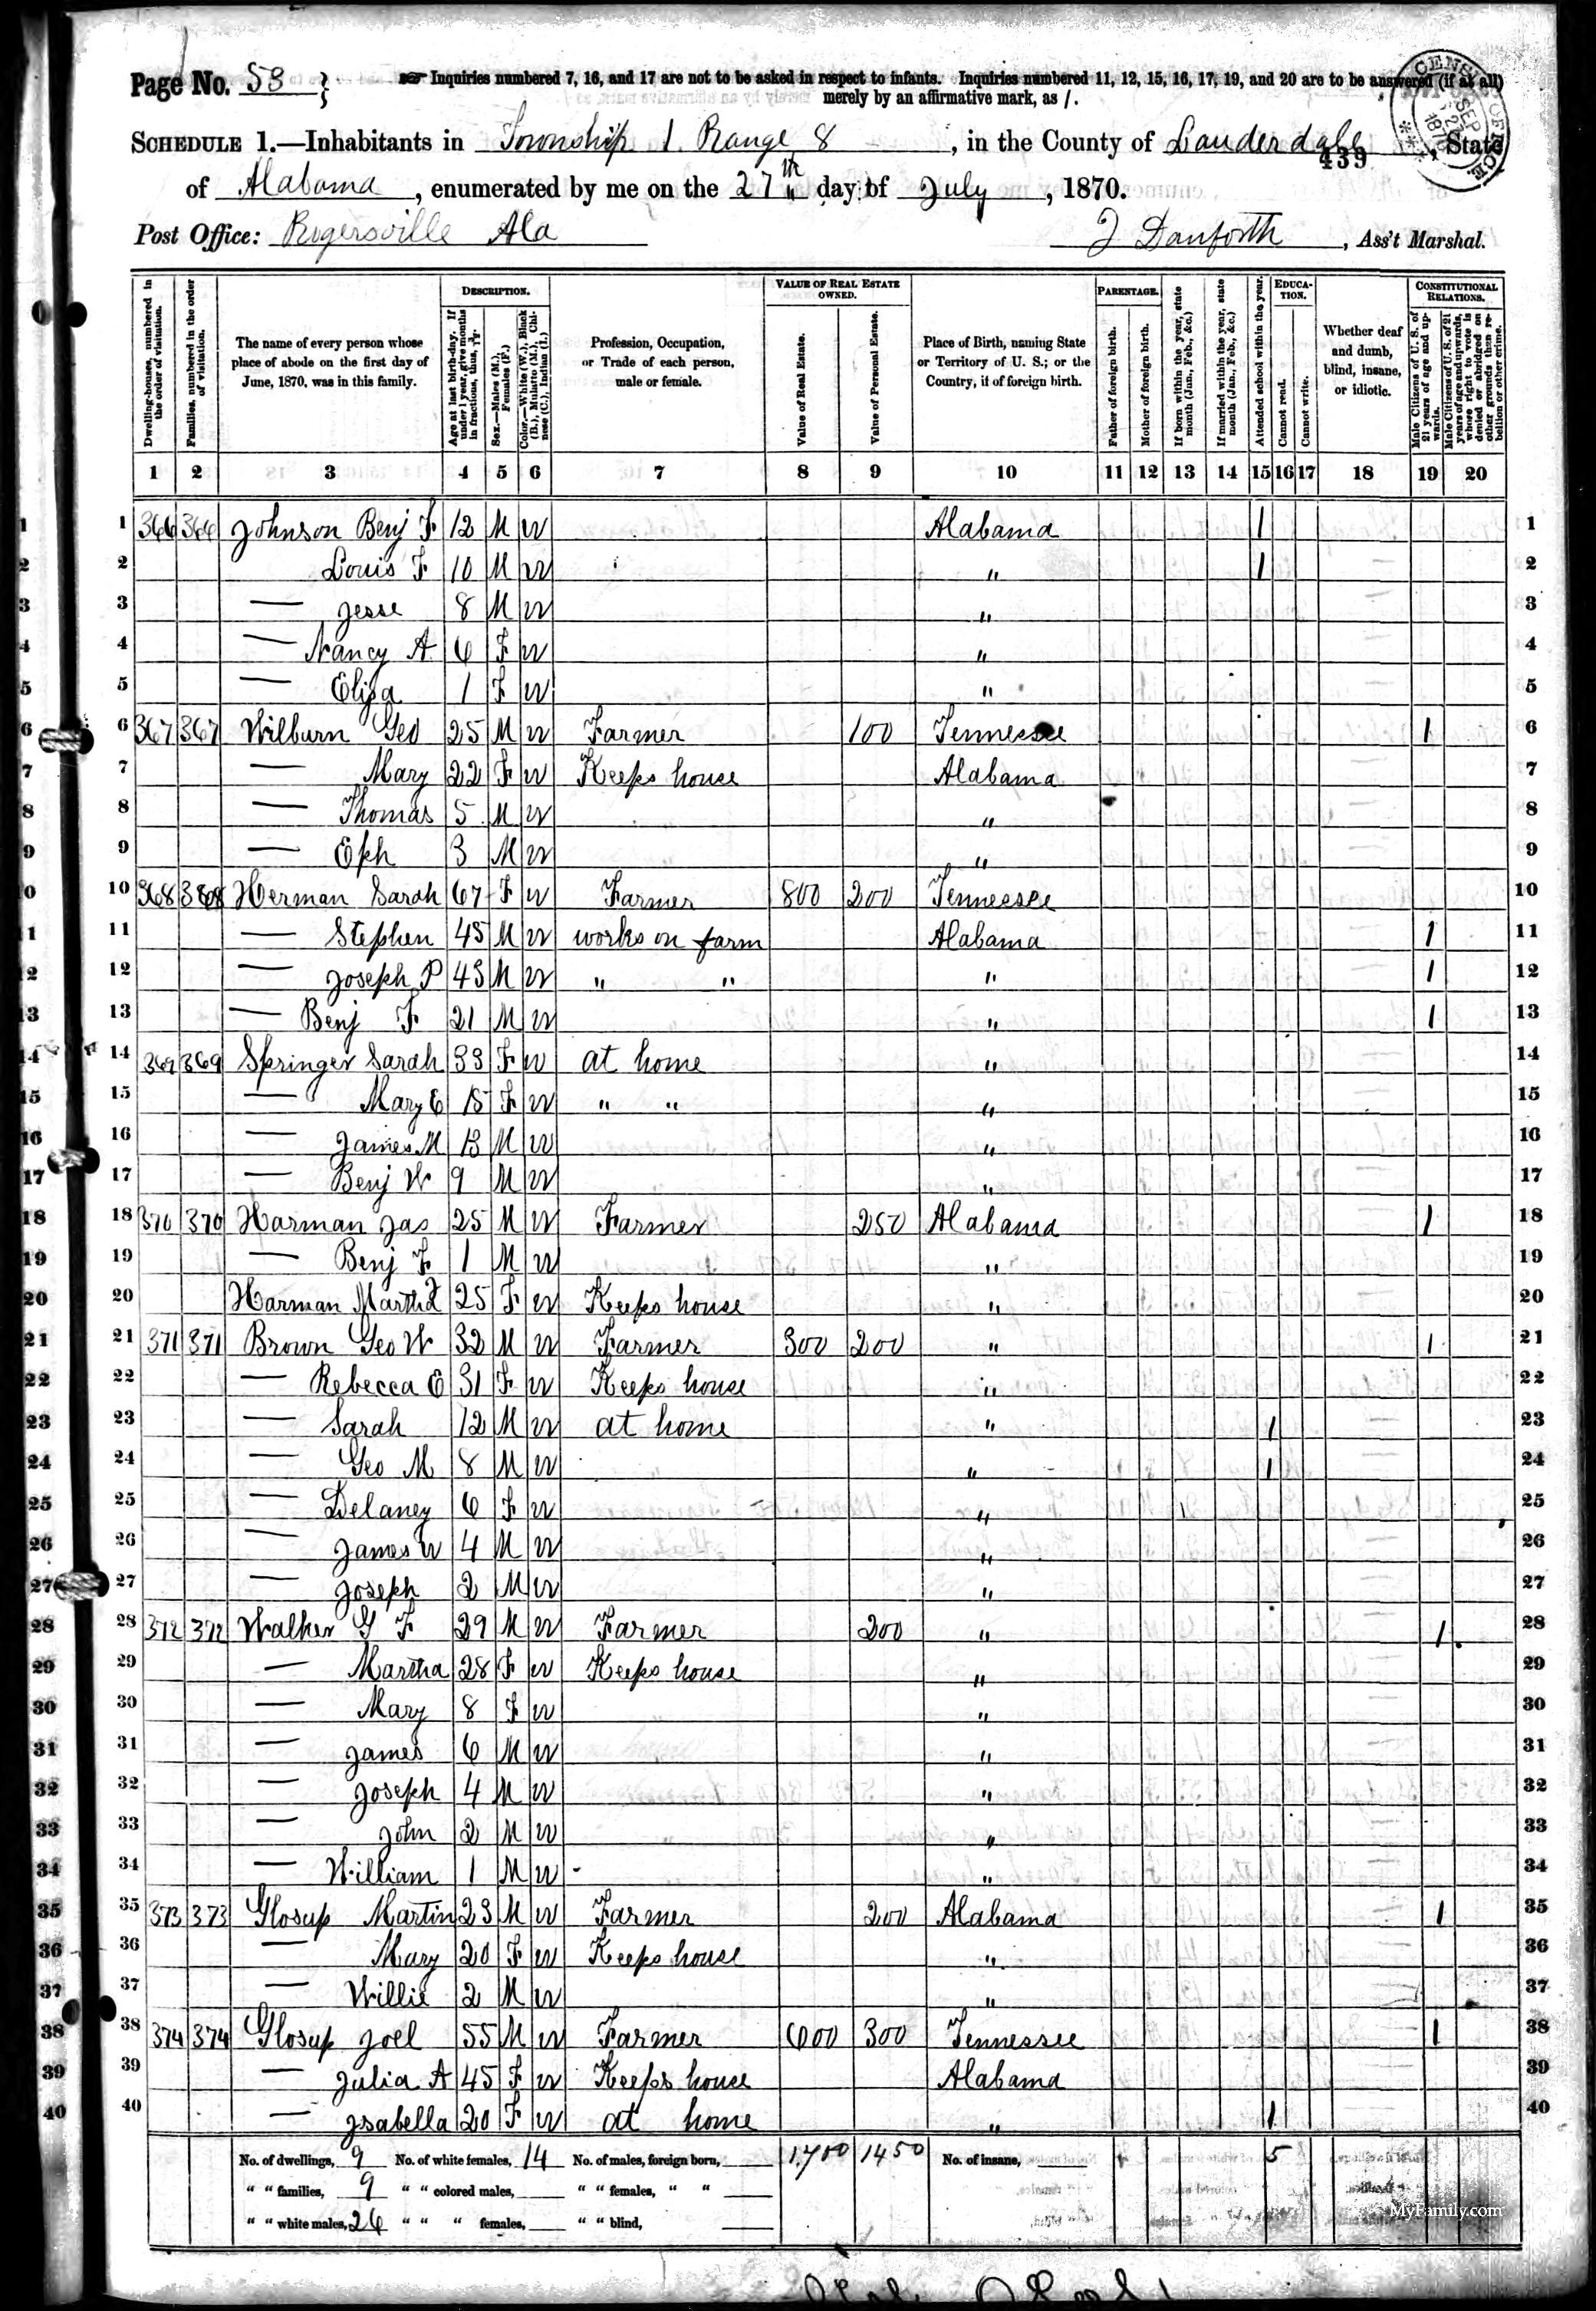 U. S. Census, Rogersville, AL, 1870